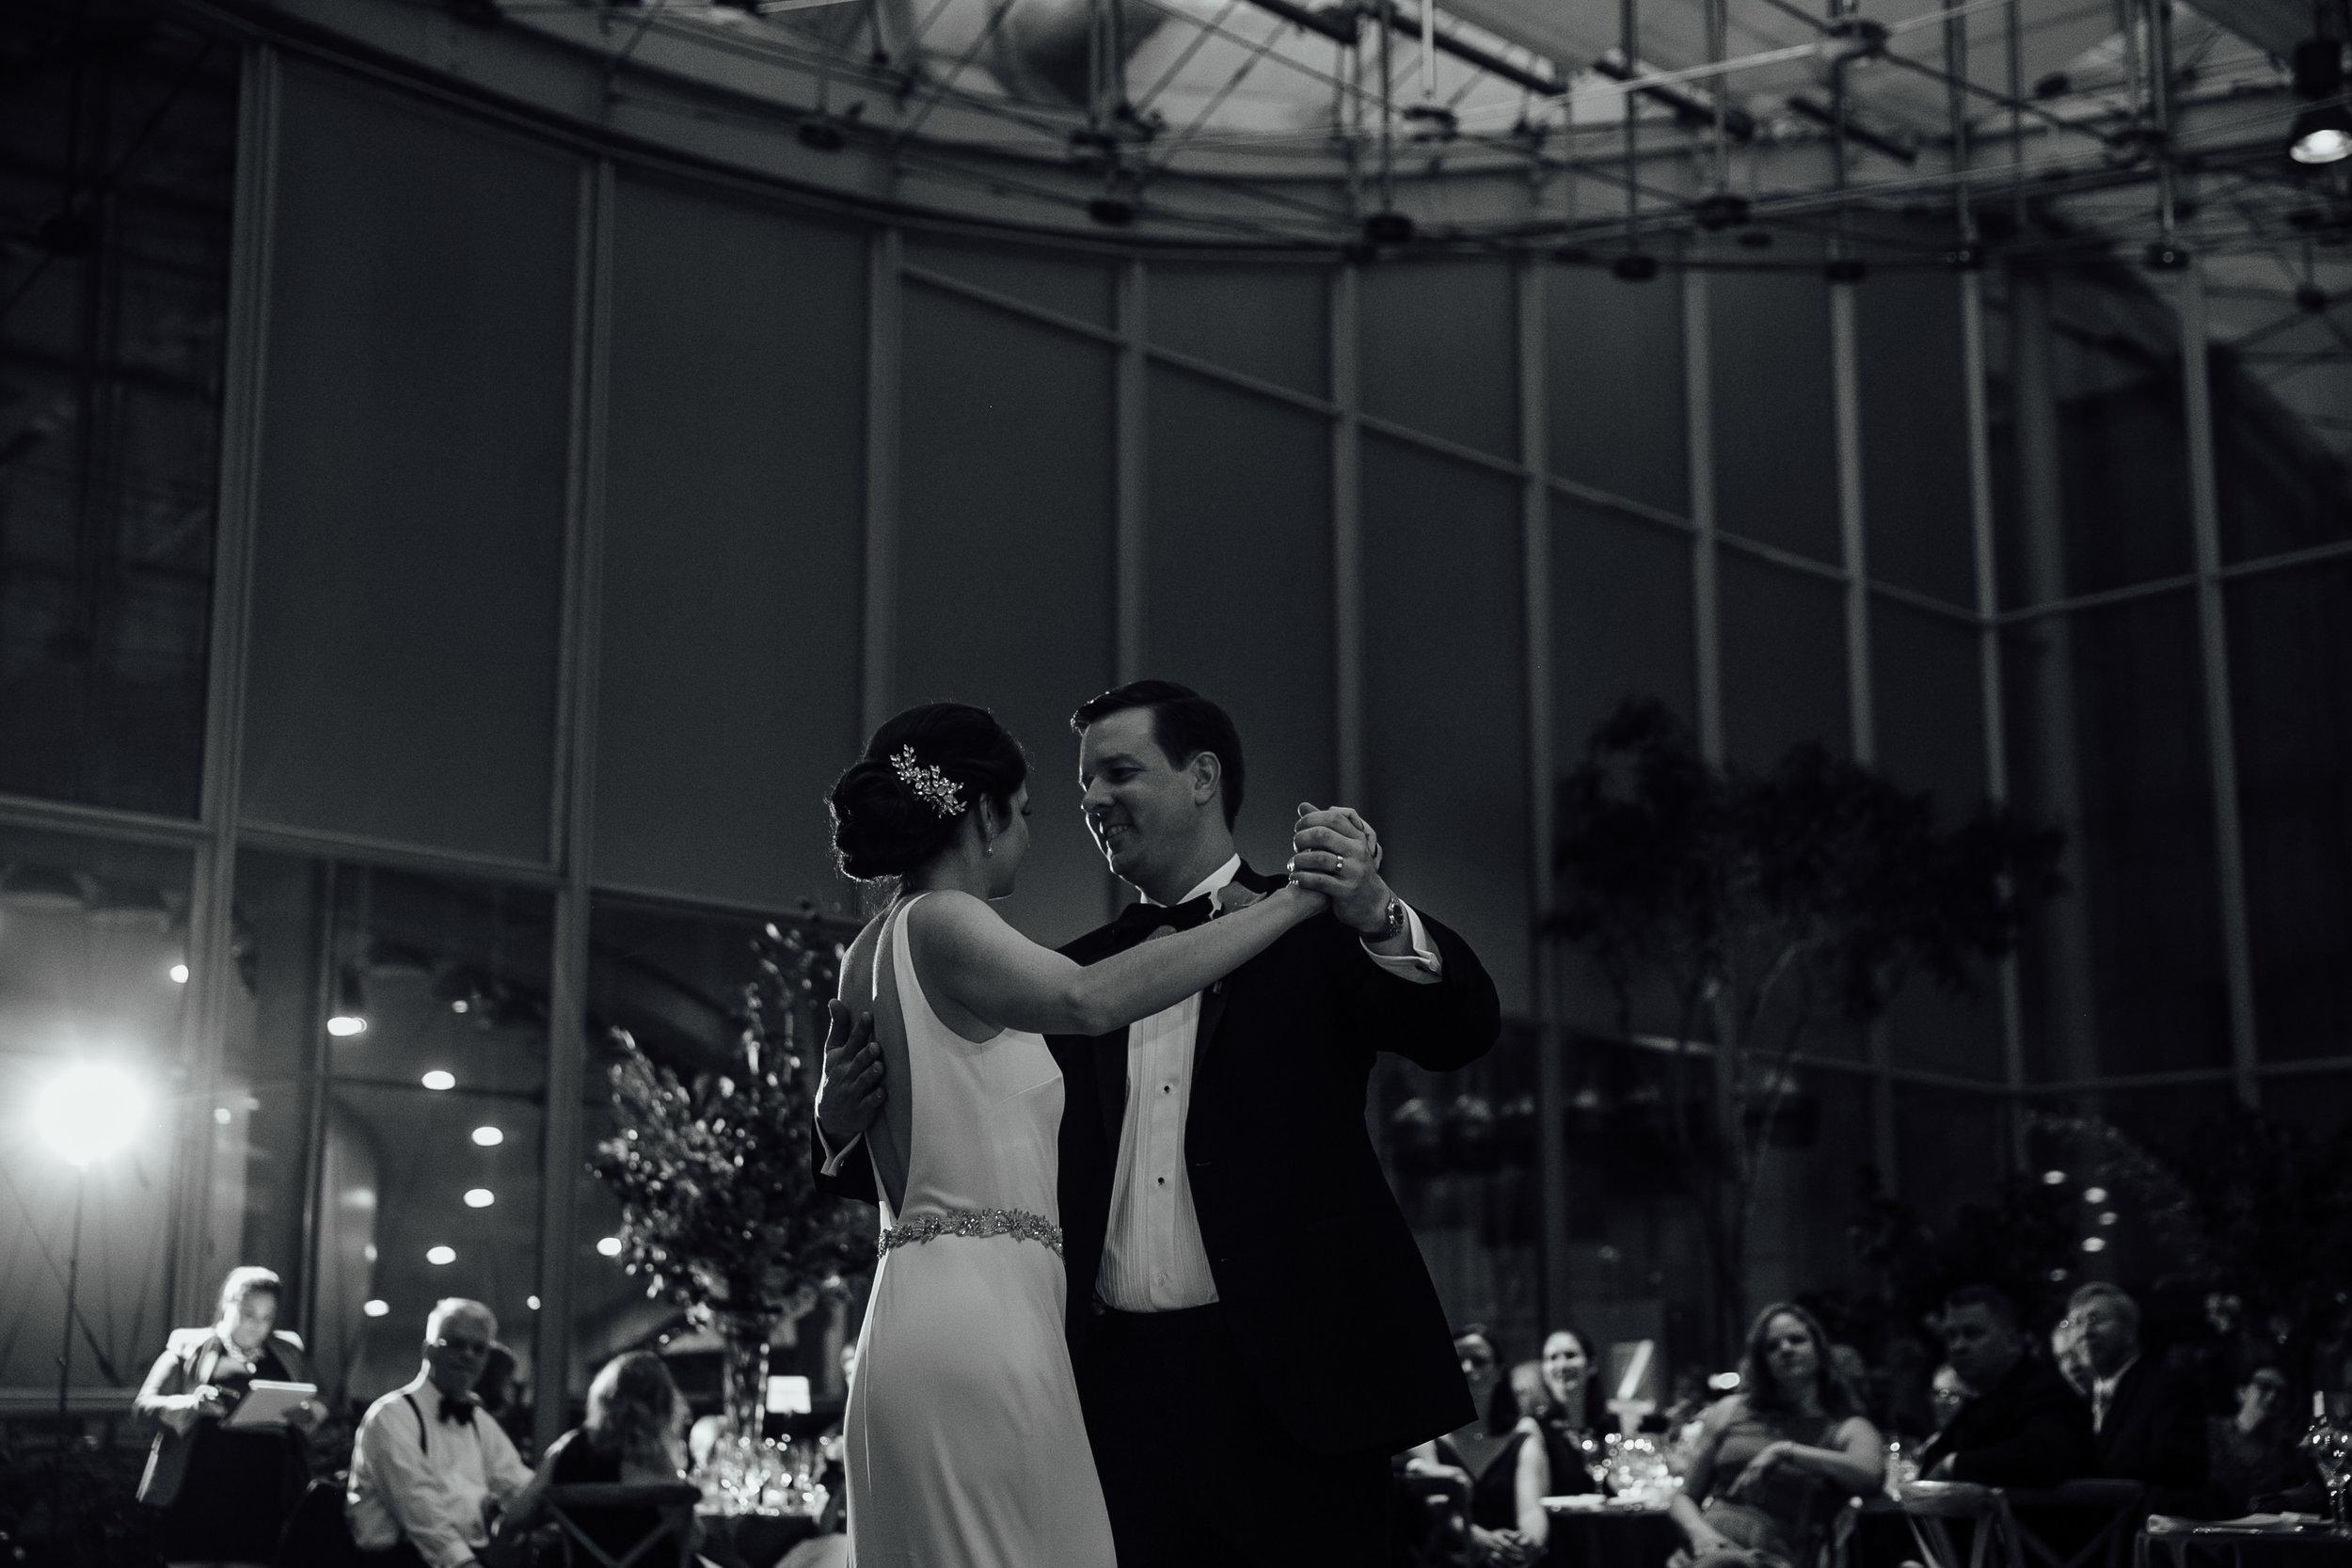 Wedding_KathleenMichael_Reception-182.jpg